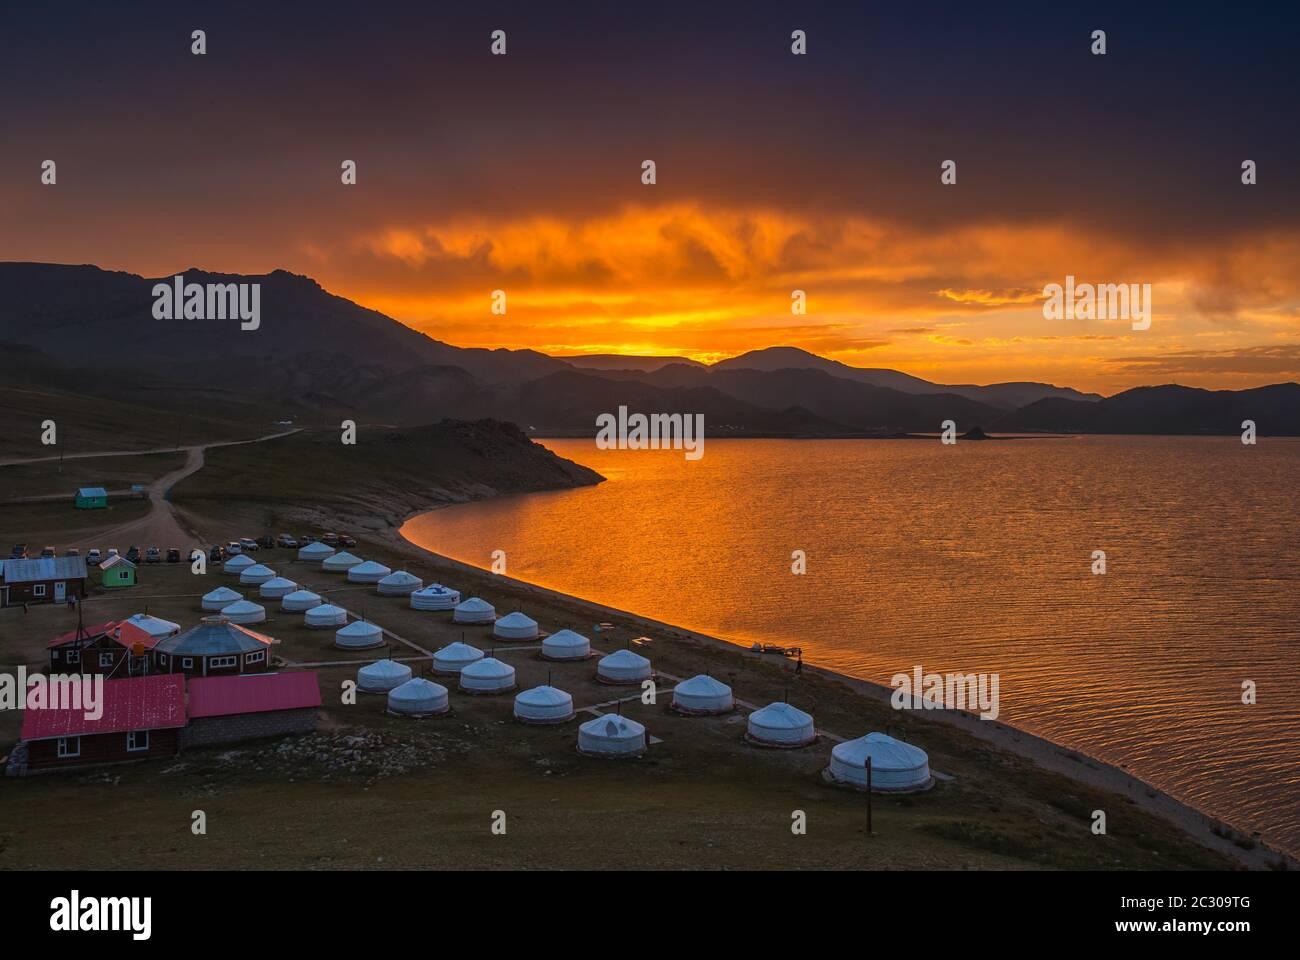 Sunrise at White Terkh Lake, ger, nomad tent, resort on the shore of the lake, Arkhangai Province, Mongolia Stock Photo